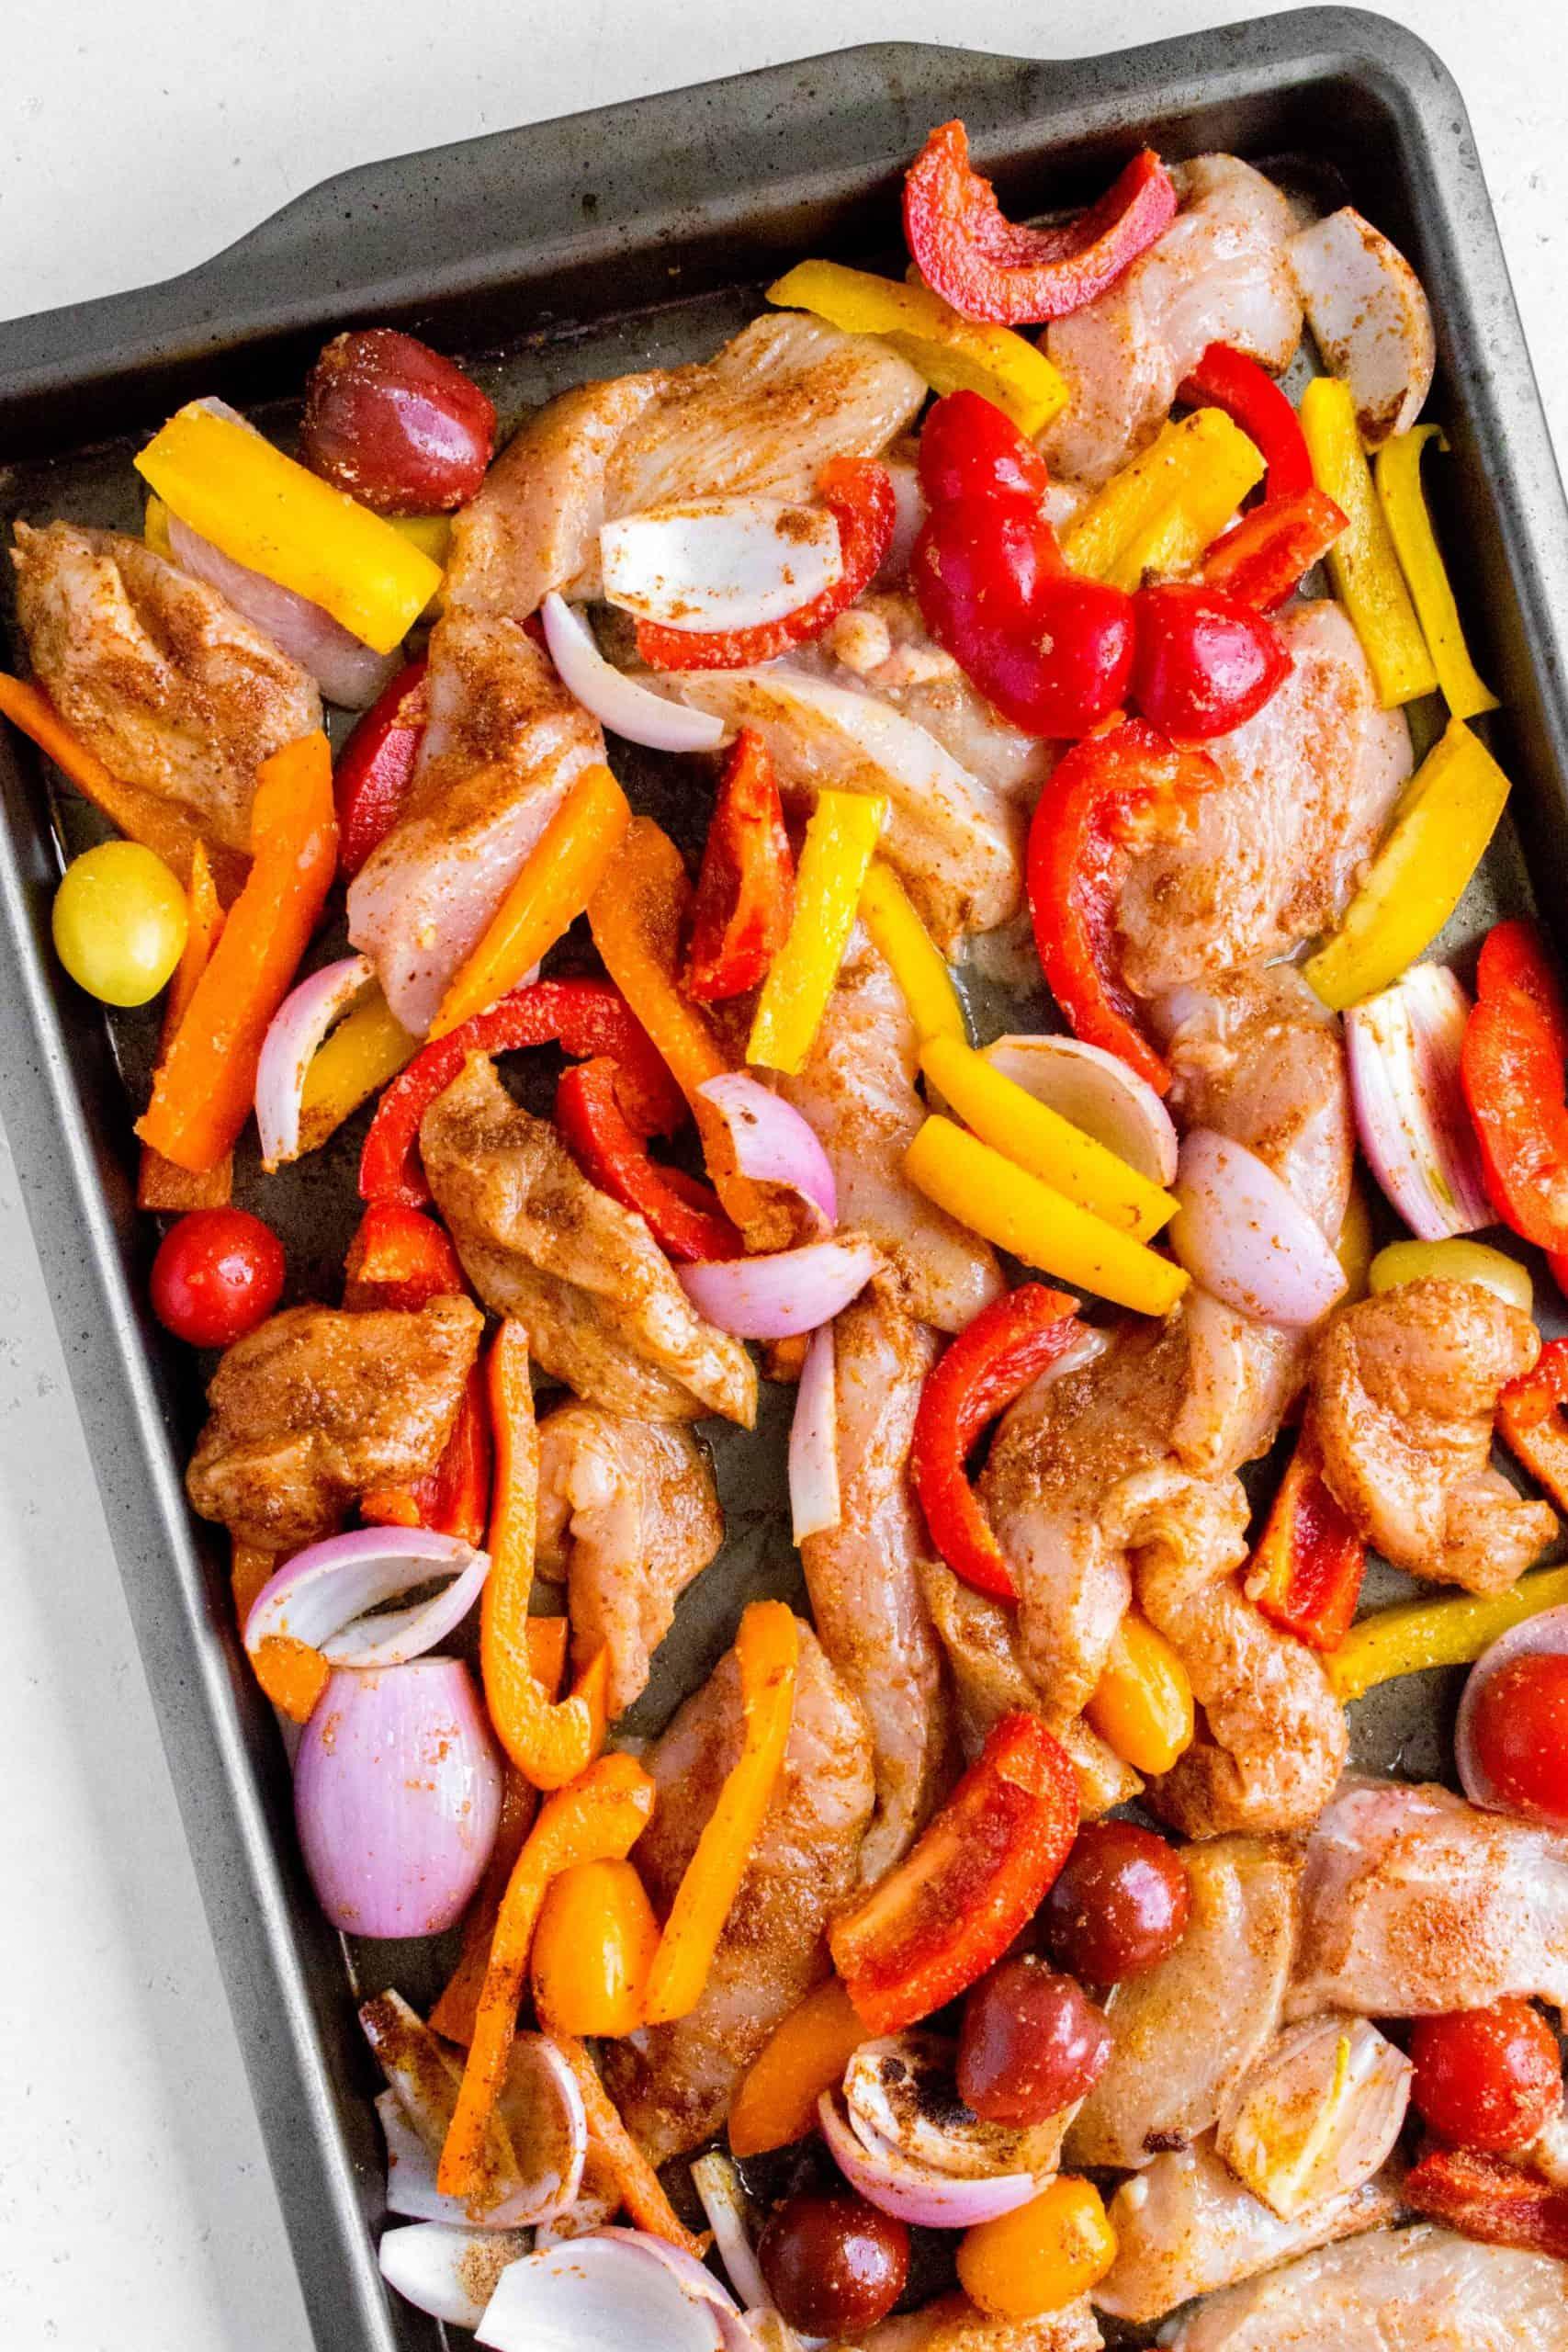 lime chili fajitas in a sheet pan before baking